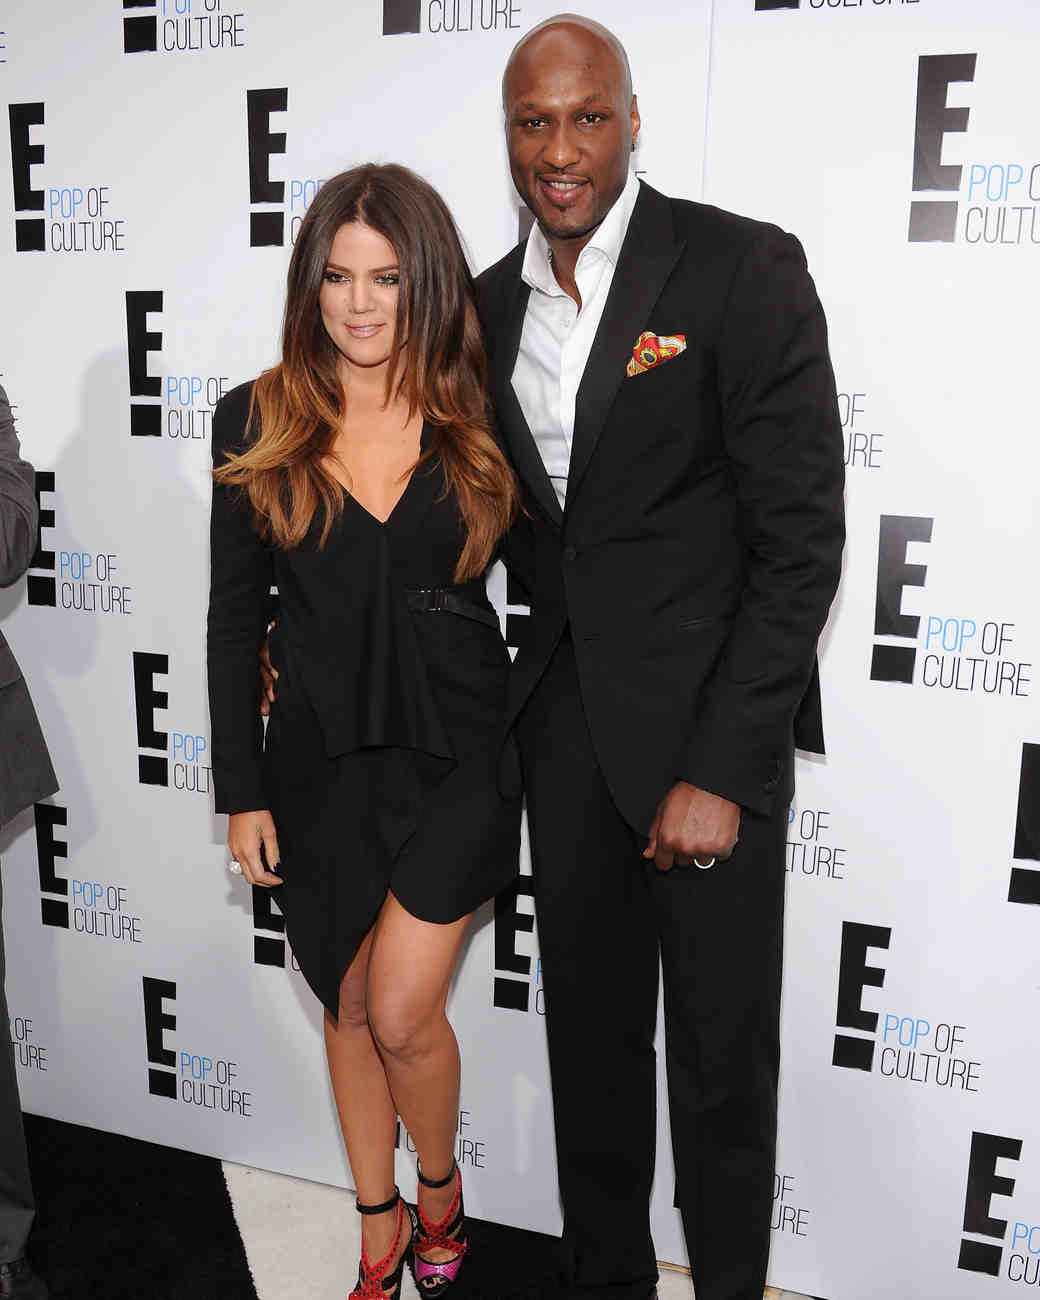 quick-celeb-engagements-khloe-kardashian-lamar-odom-0716.jpg